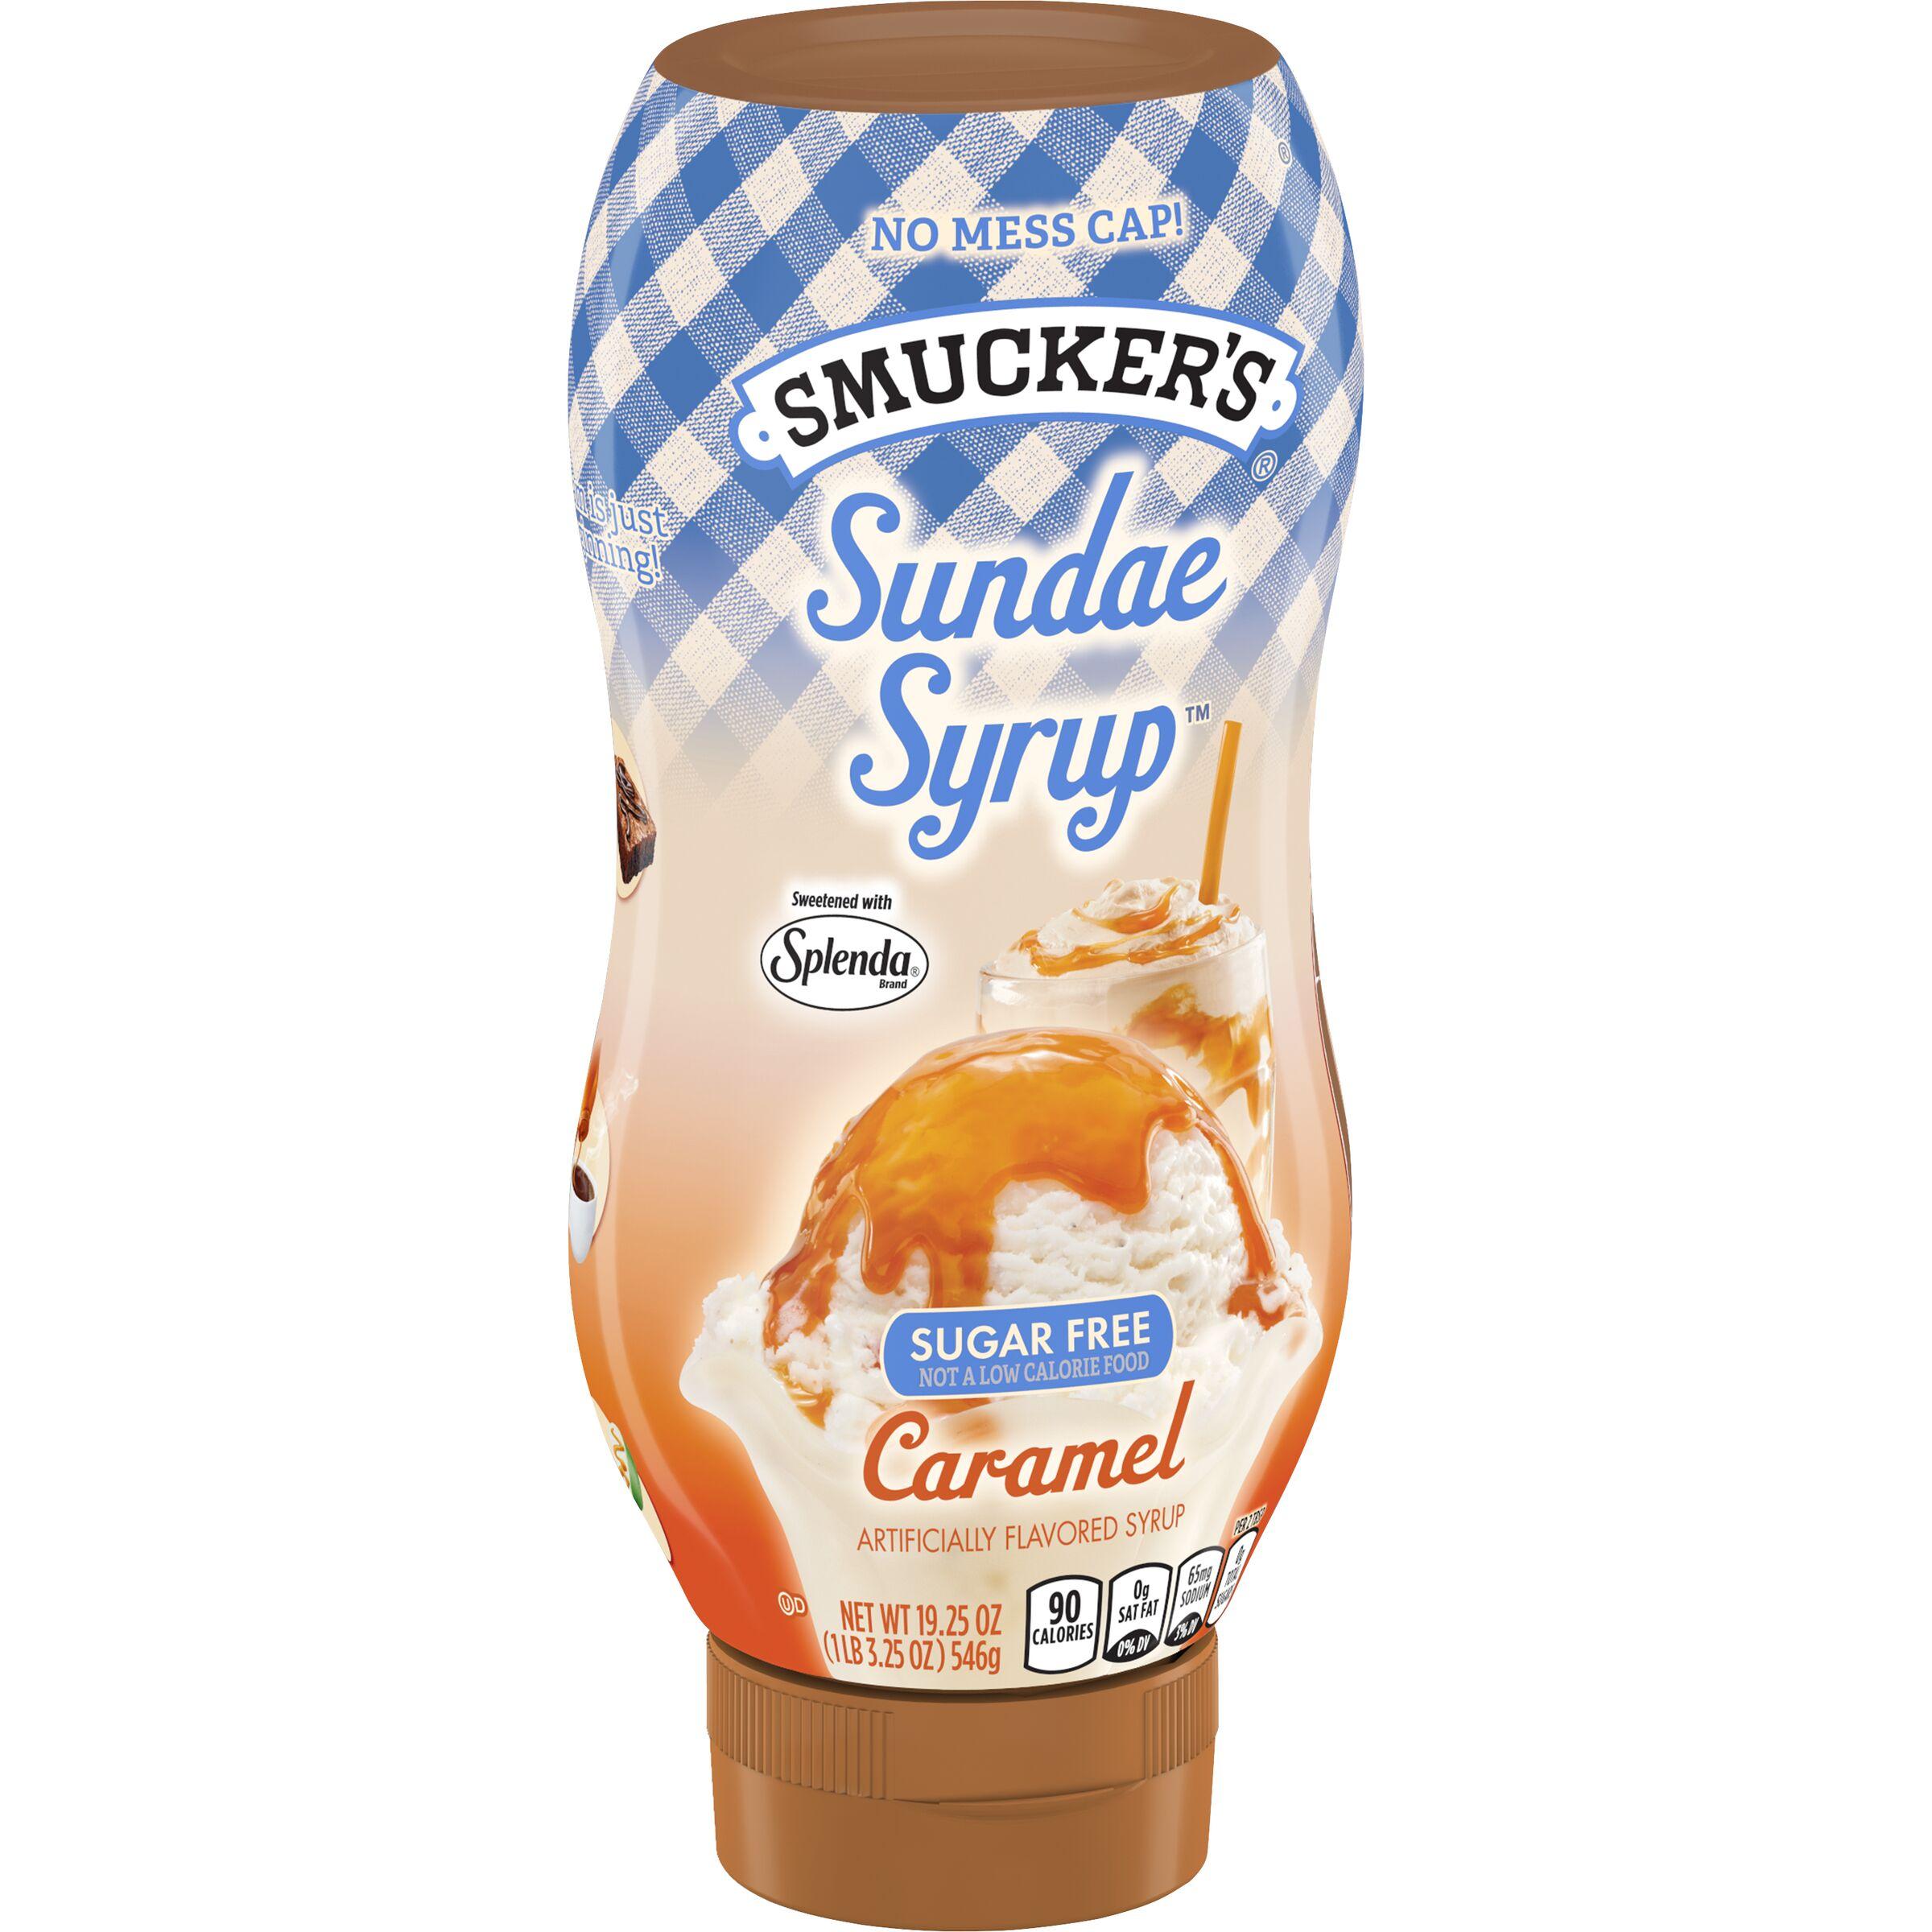 Smucker's Sundae Syrup - Sugar Free Caramel